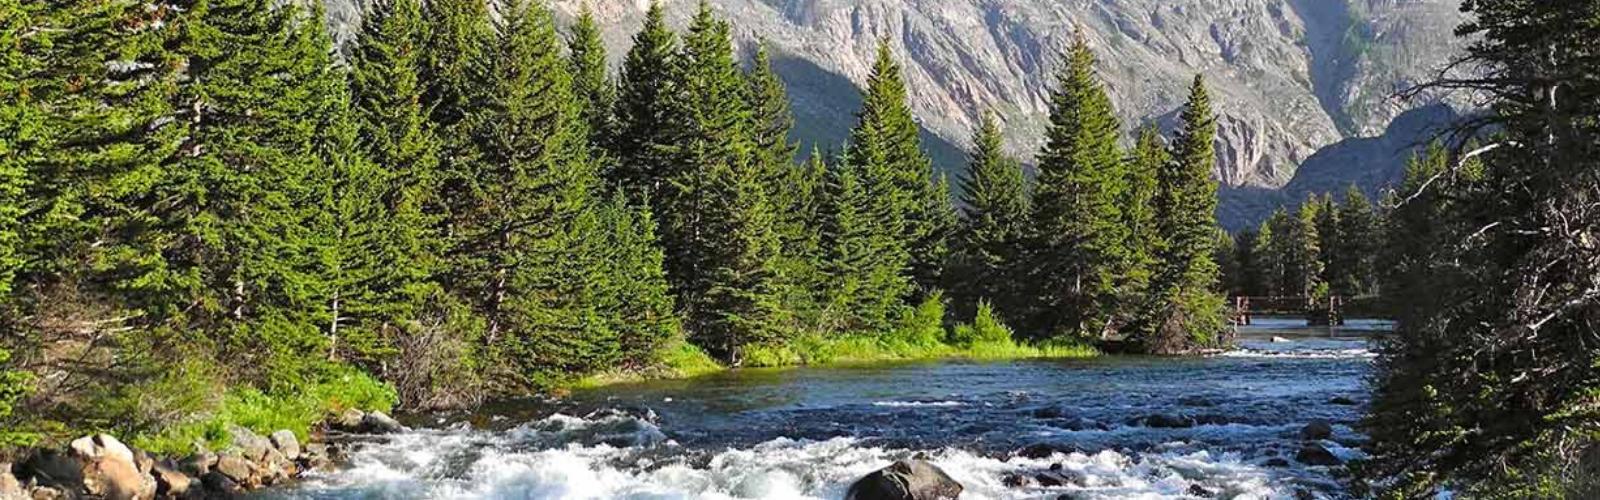 East-Rosebud-Creek-MT-credit-Michael-Fiebig-header